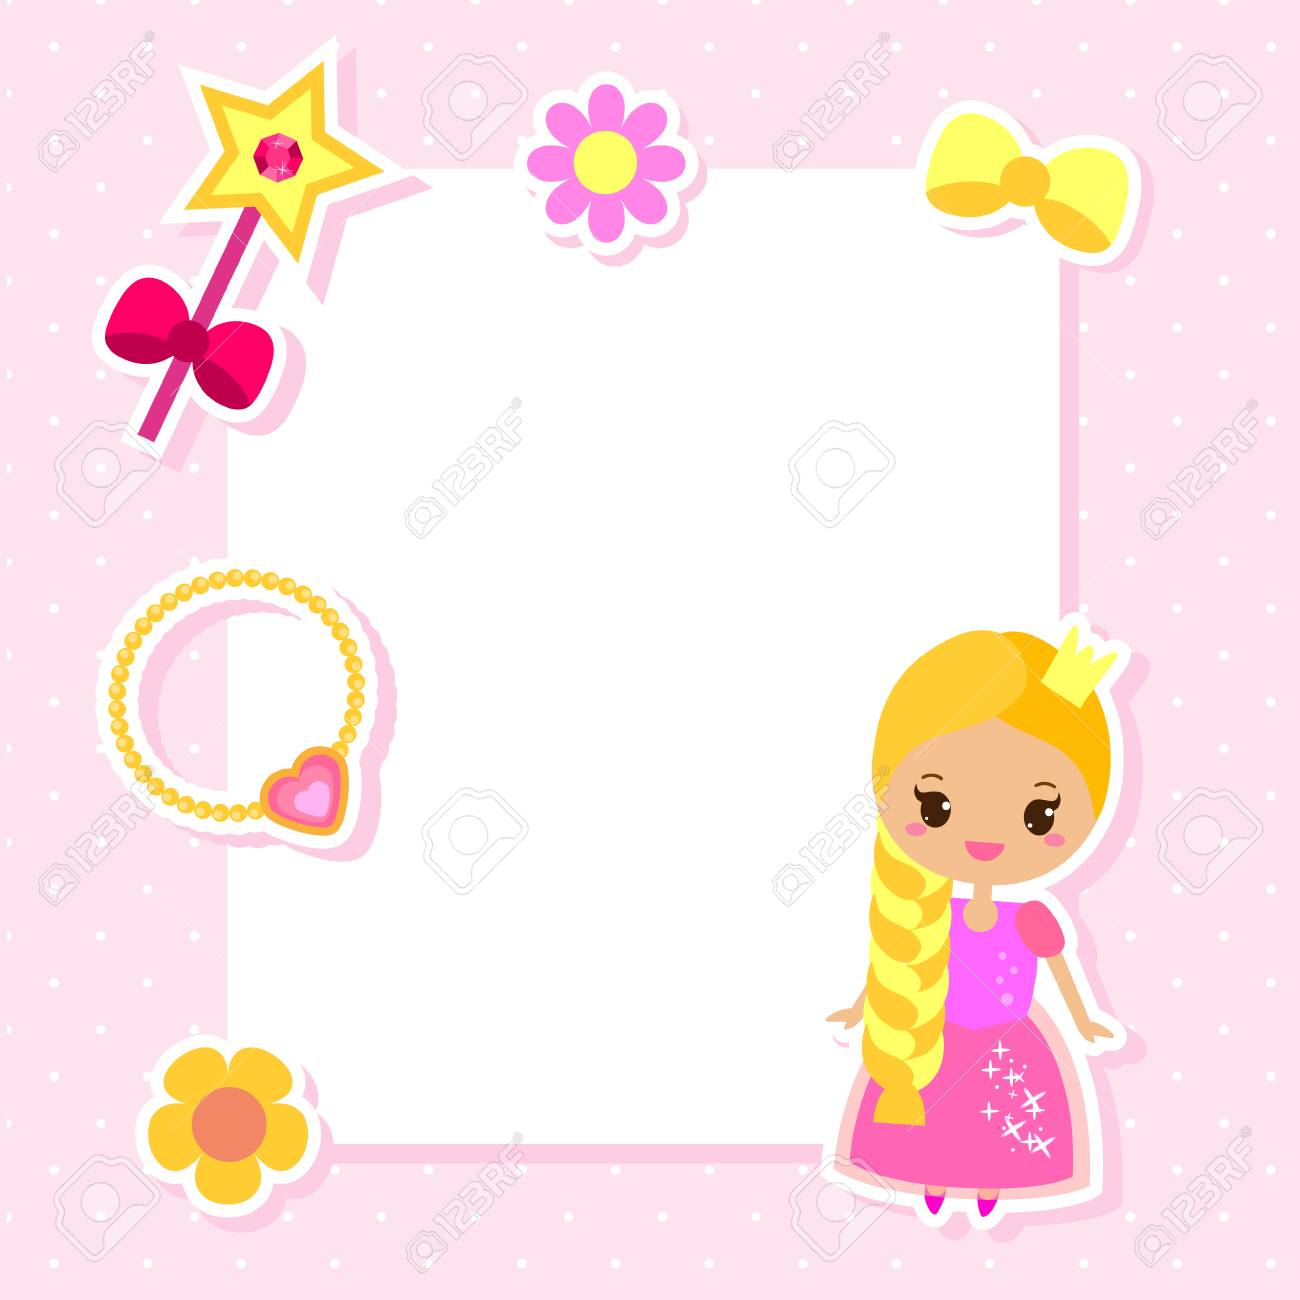 Princess Frame Design Template For Photos, Children Diplomas ...